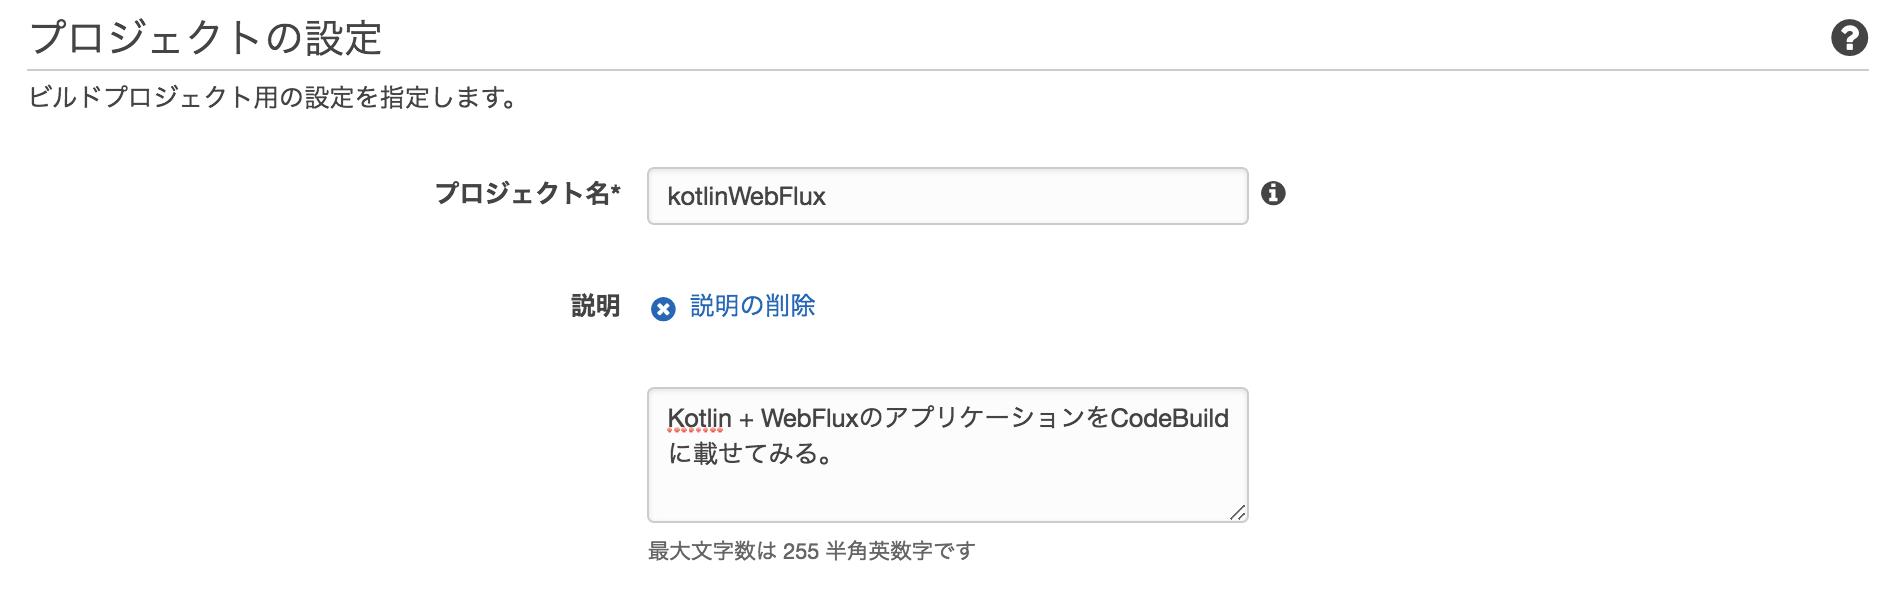 codebuild1.png